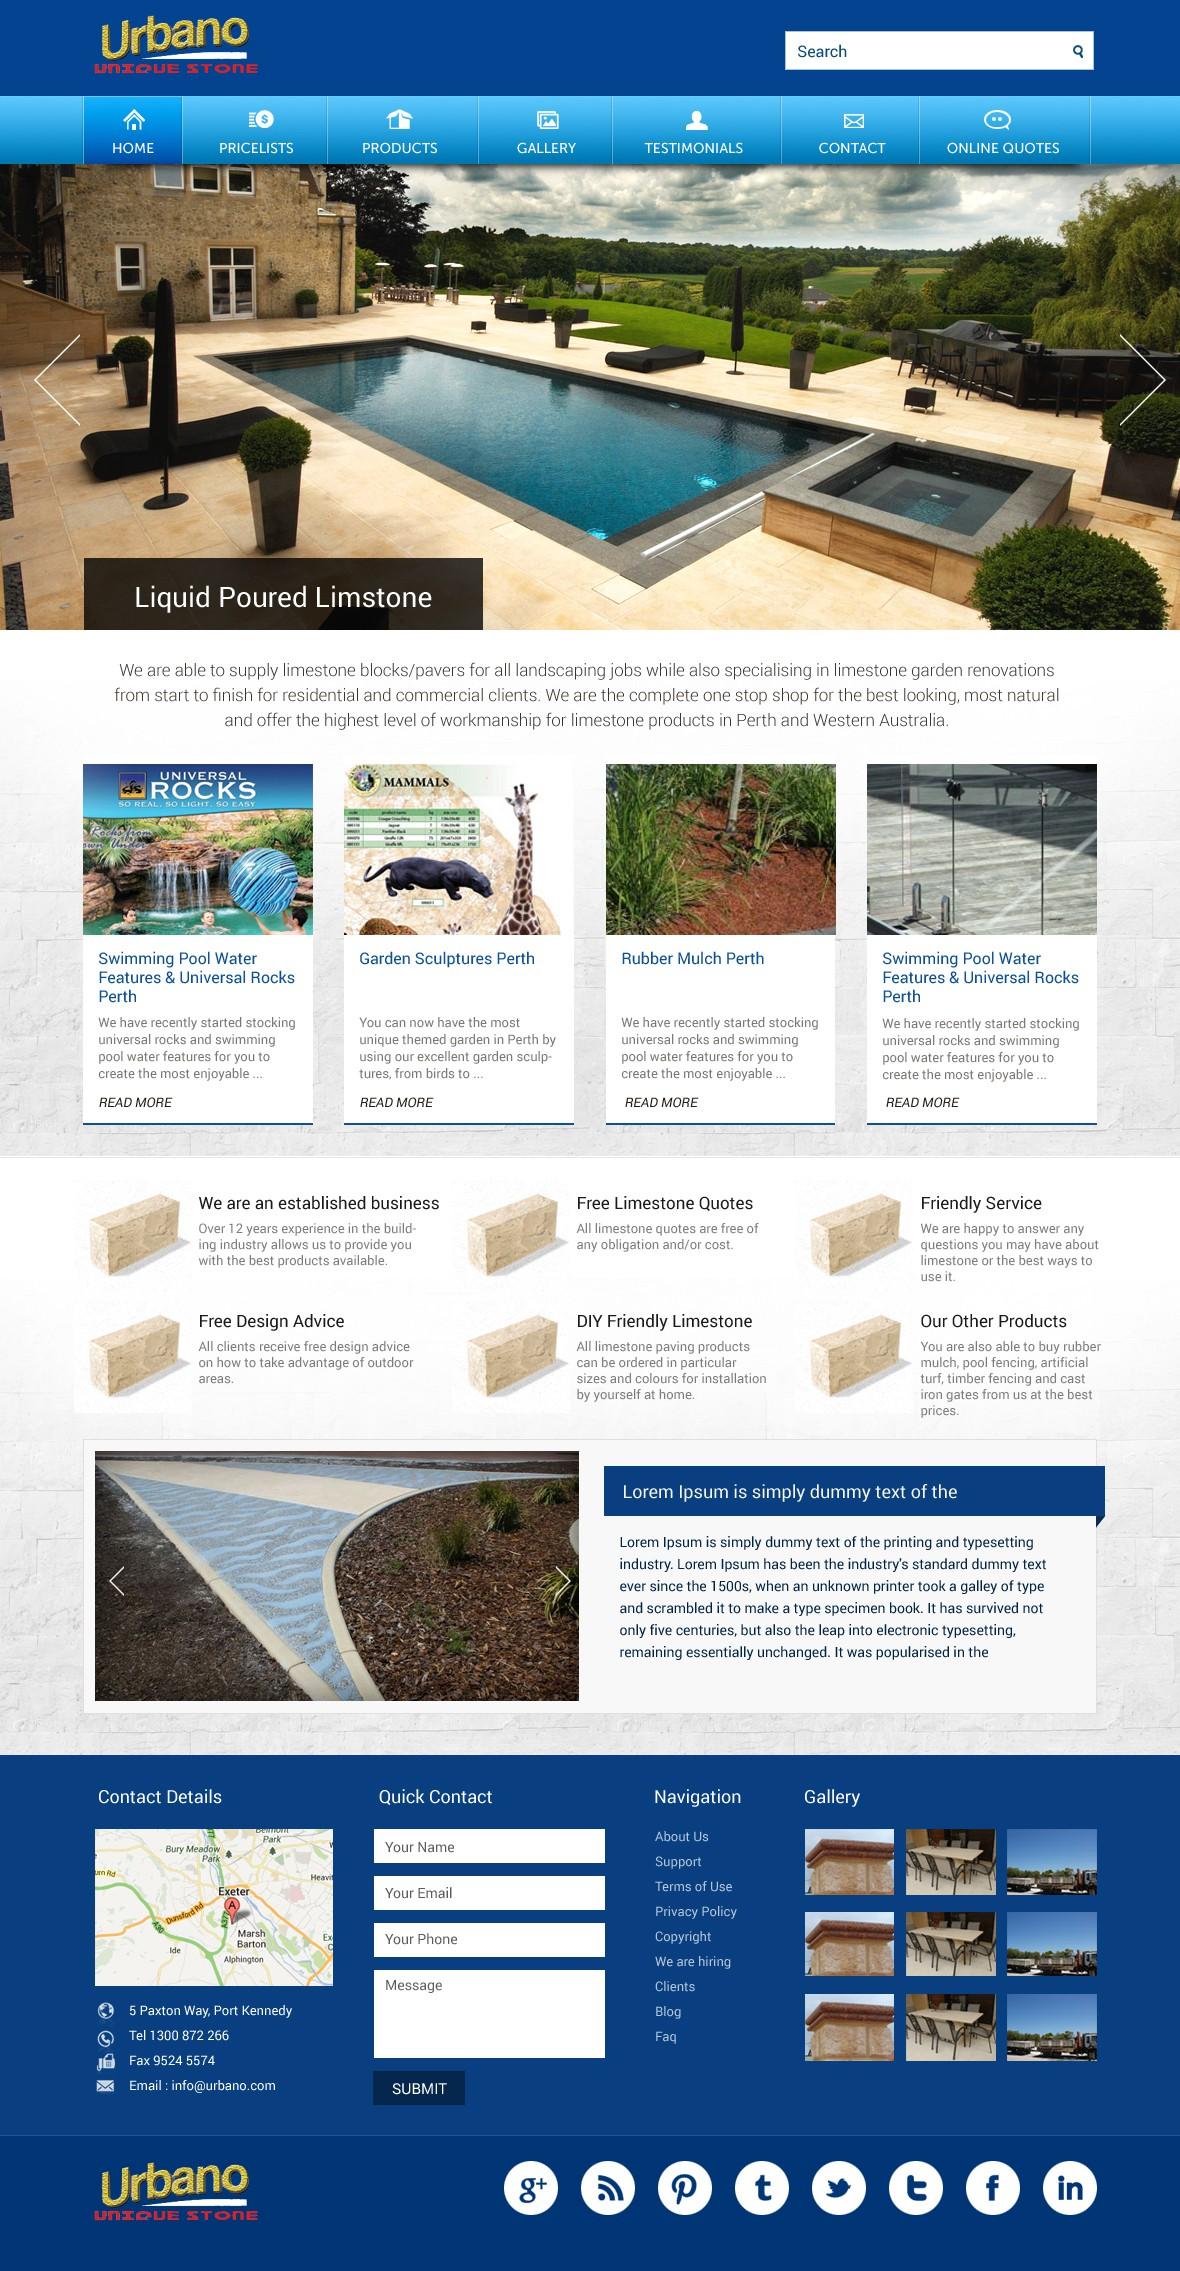 Help Urbano Unique Stone with a new website design